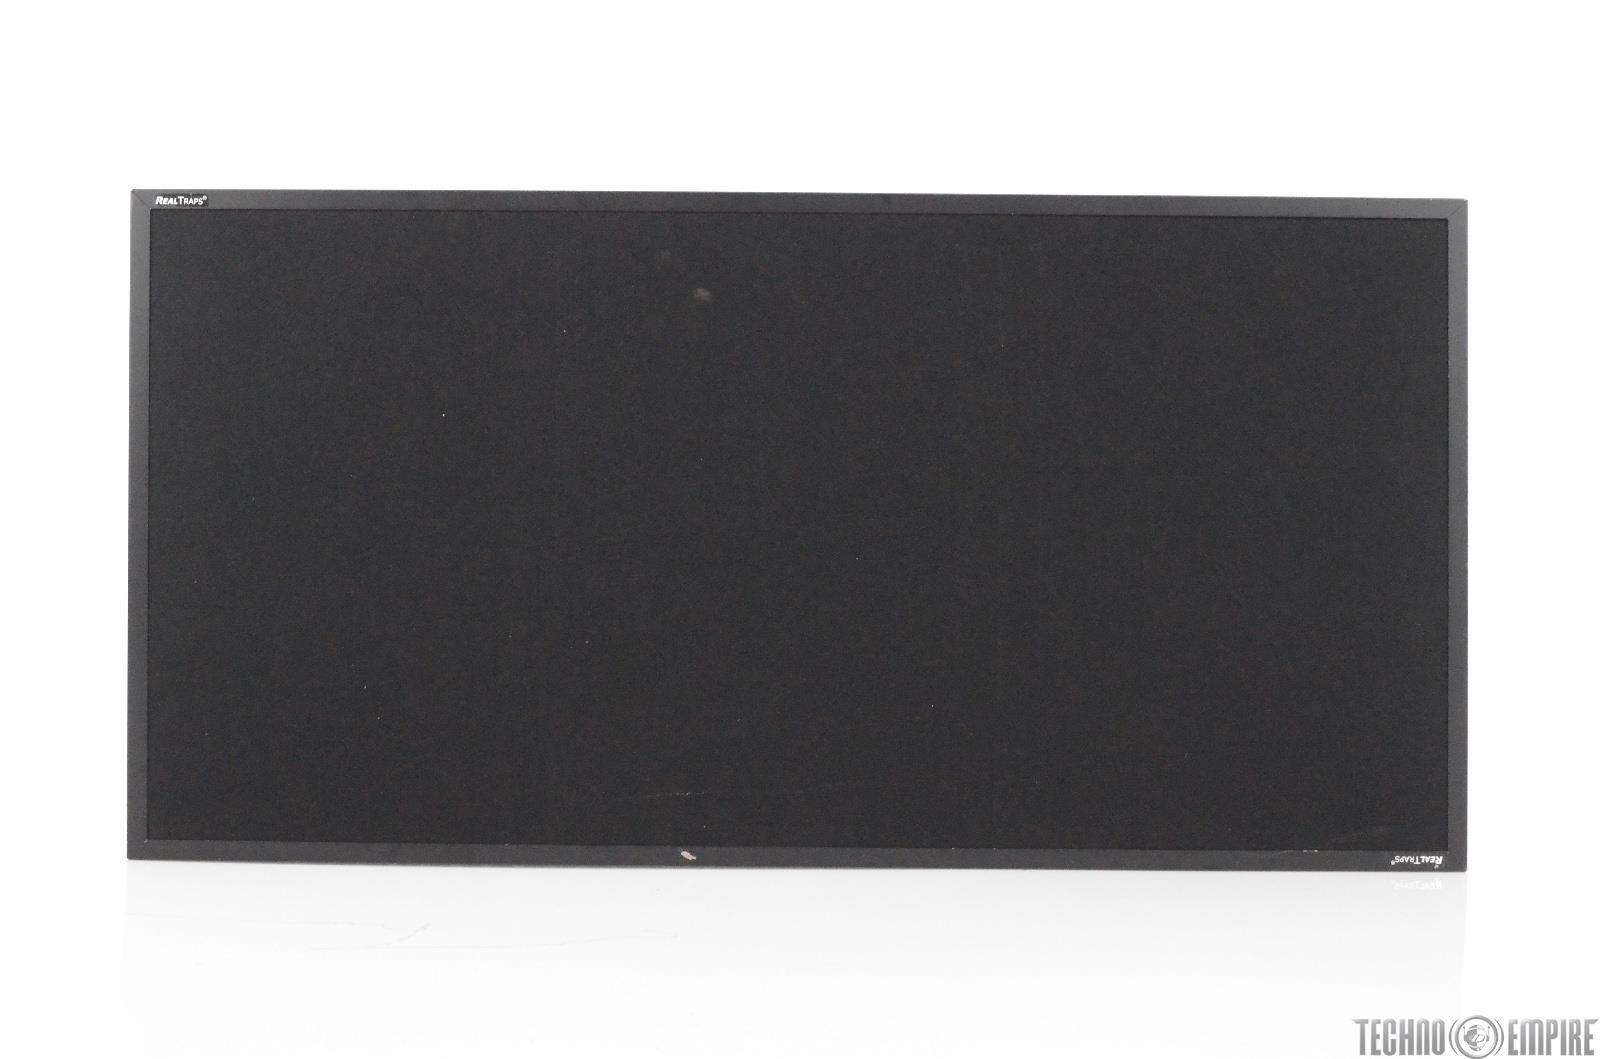 4 RealTraps 2x4 MiniTraps Absorptive Acoustic Treatments Black #29716